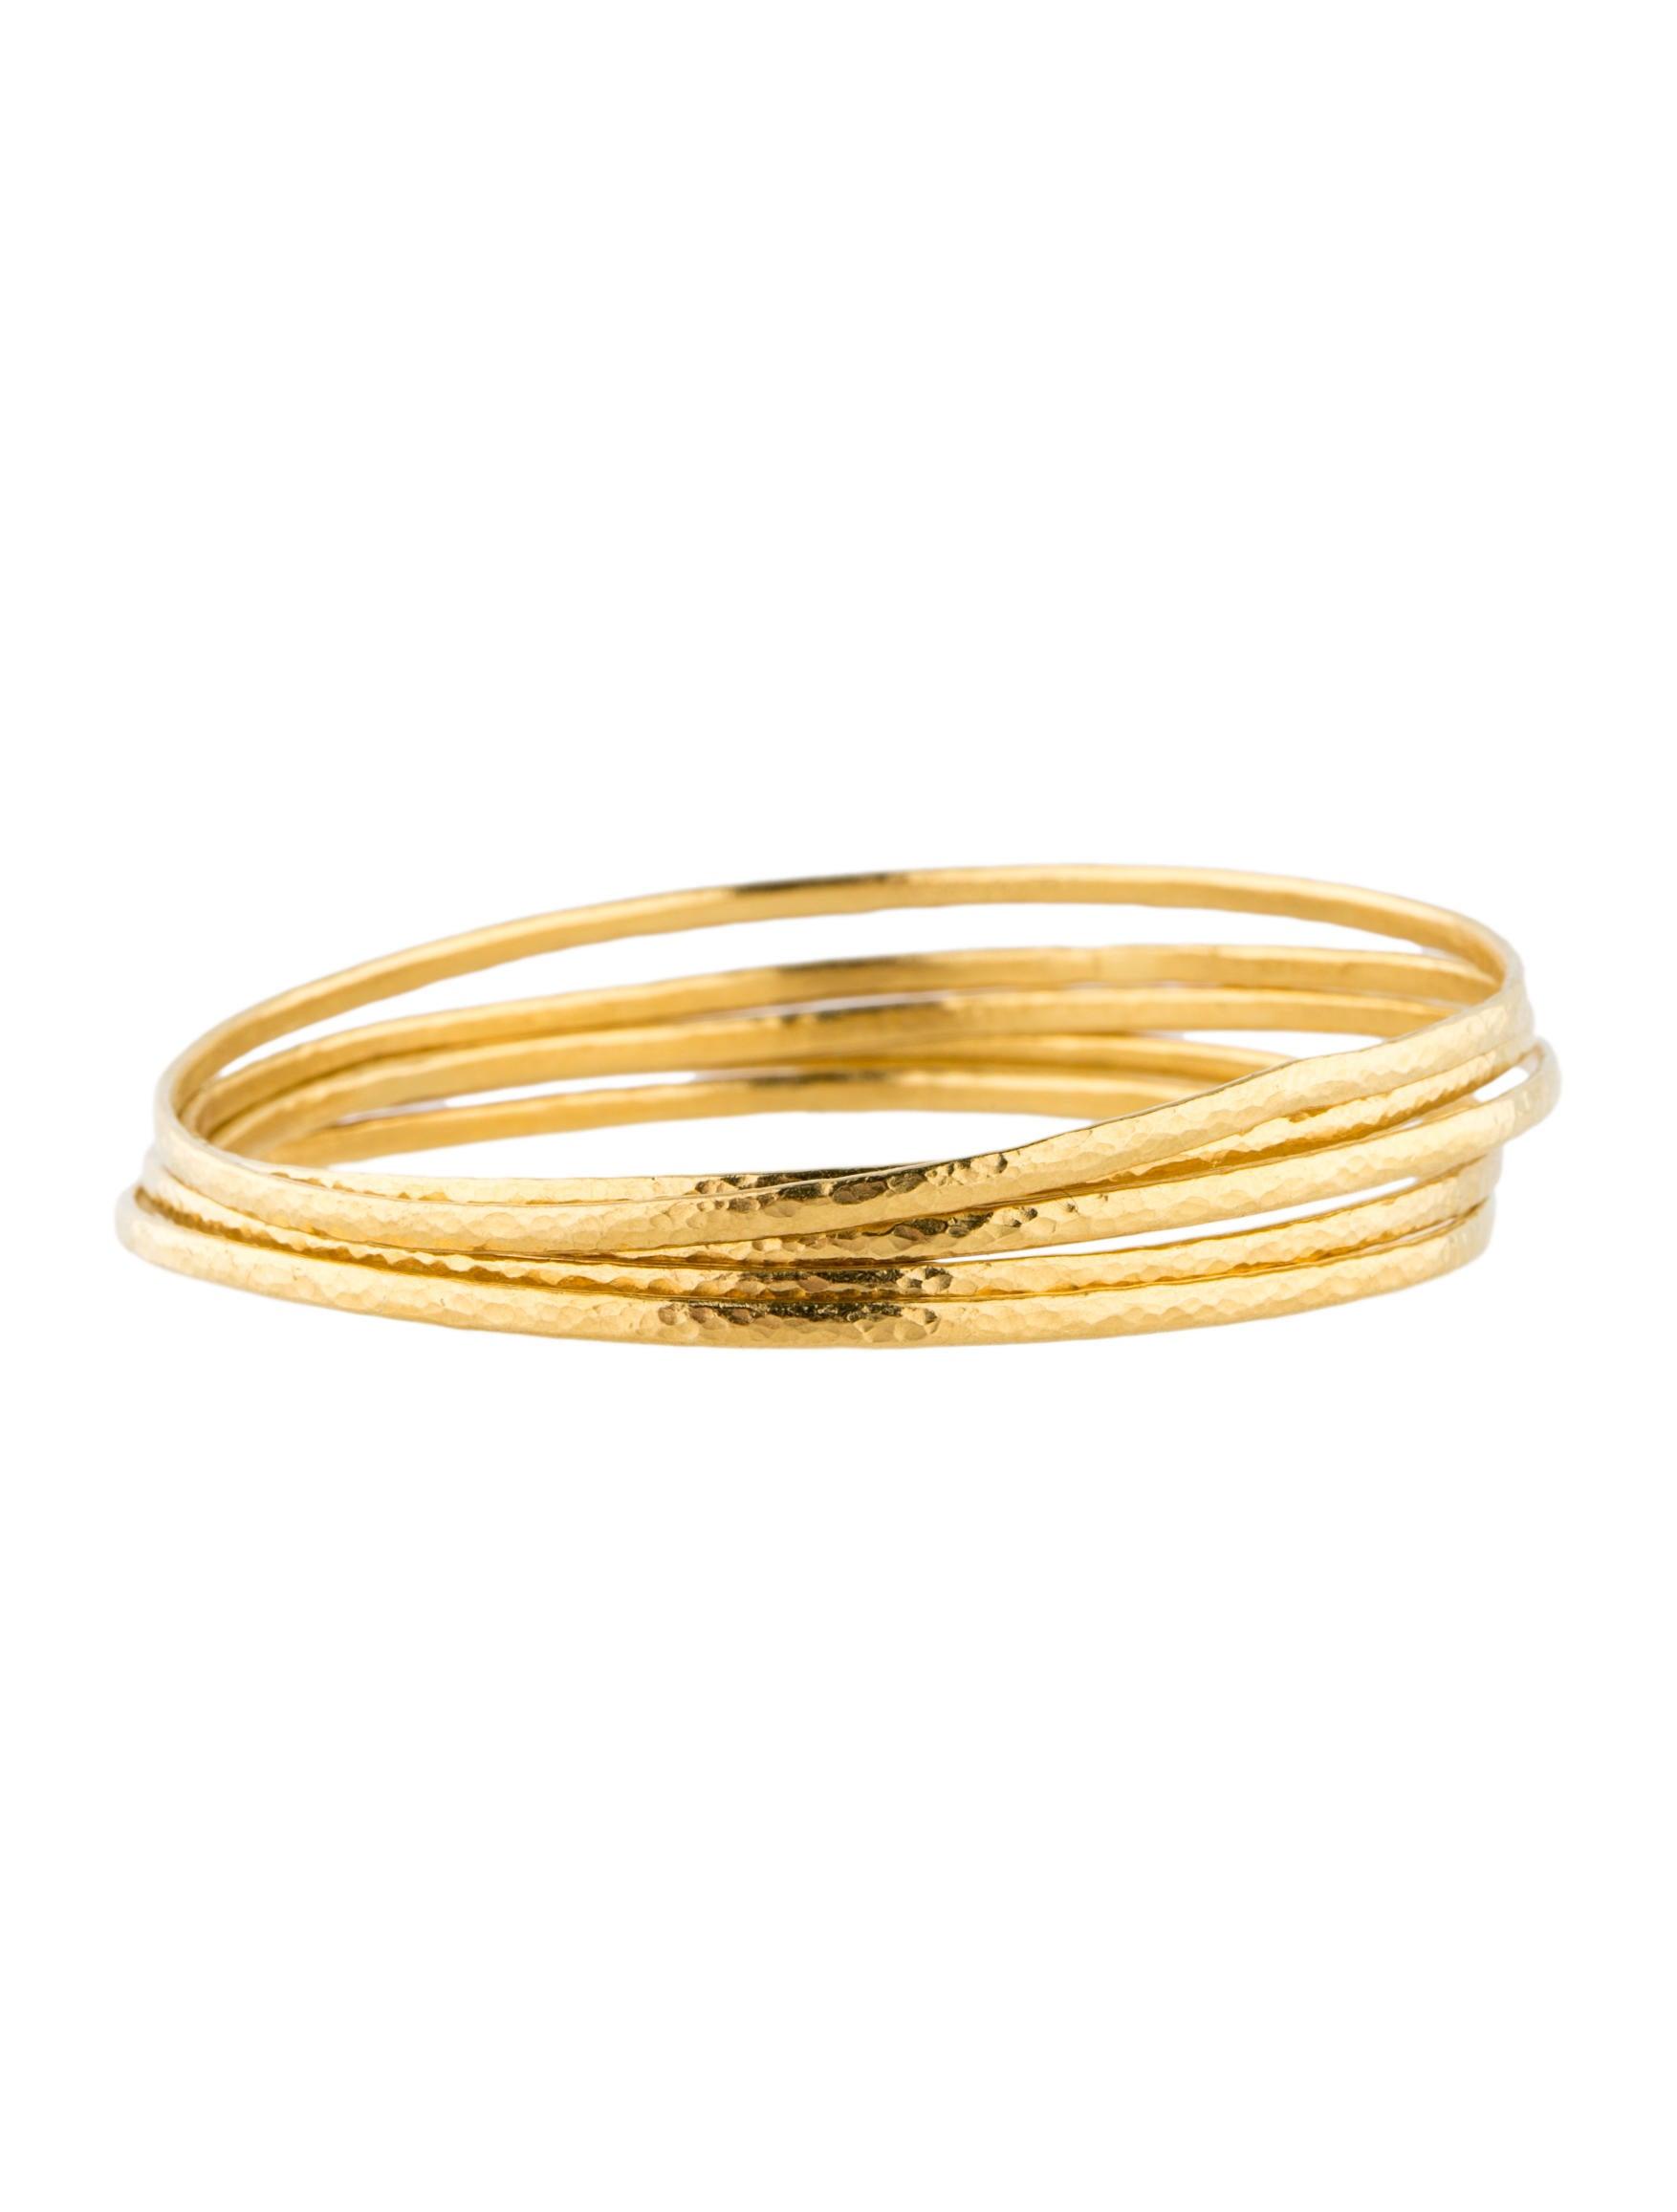 Gurhan 22K Yellow Gold Bangle Set - Jewelry - GUR20171 ...